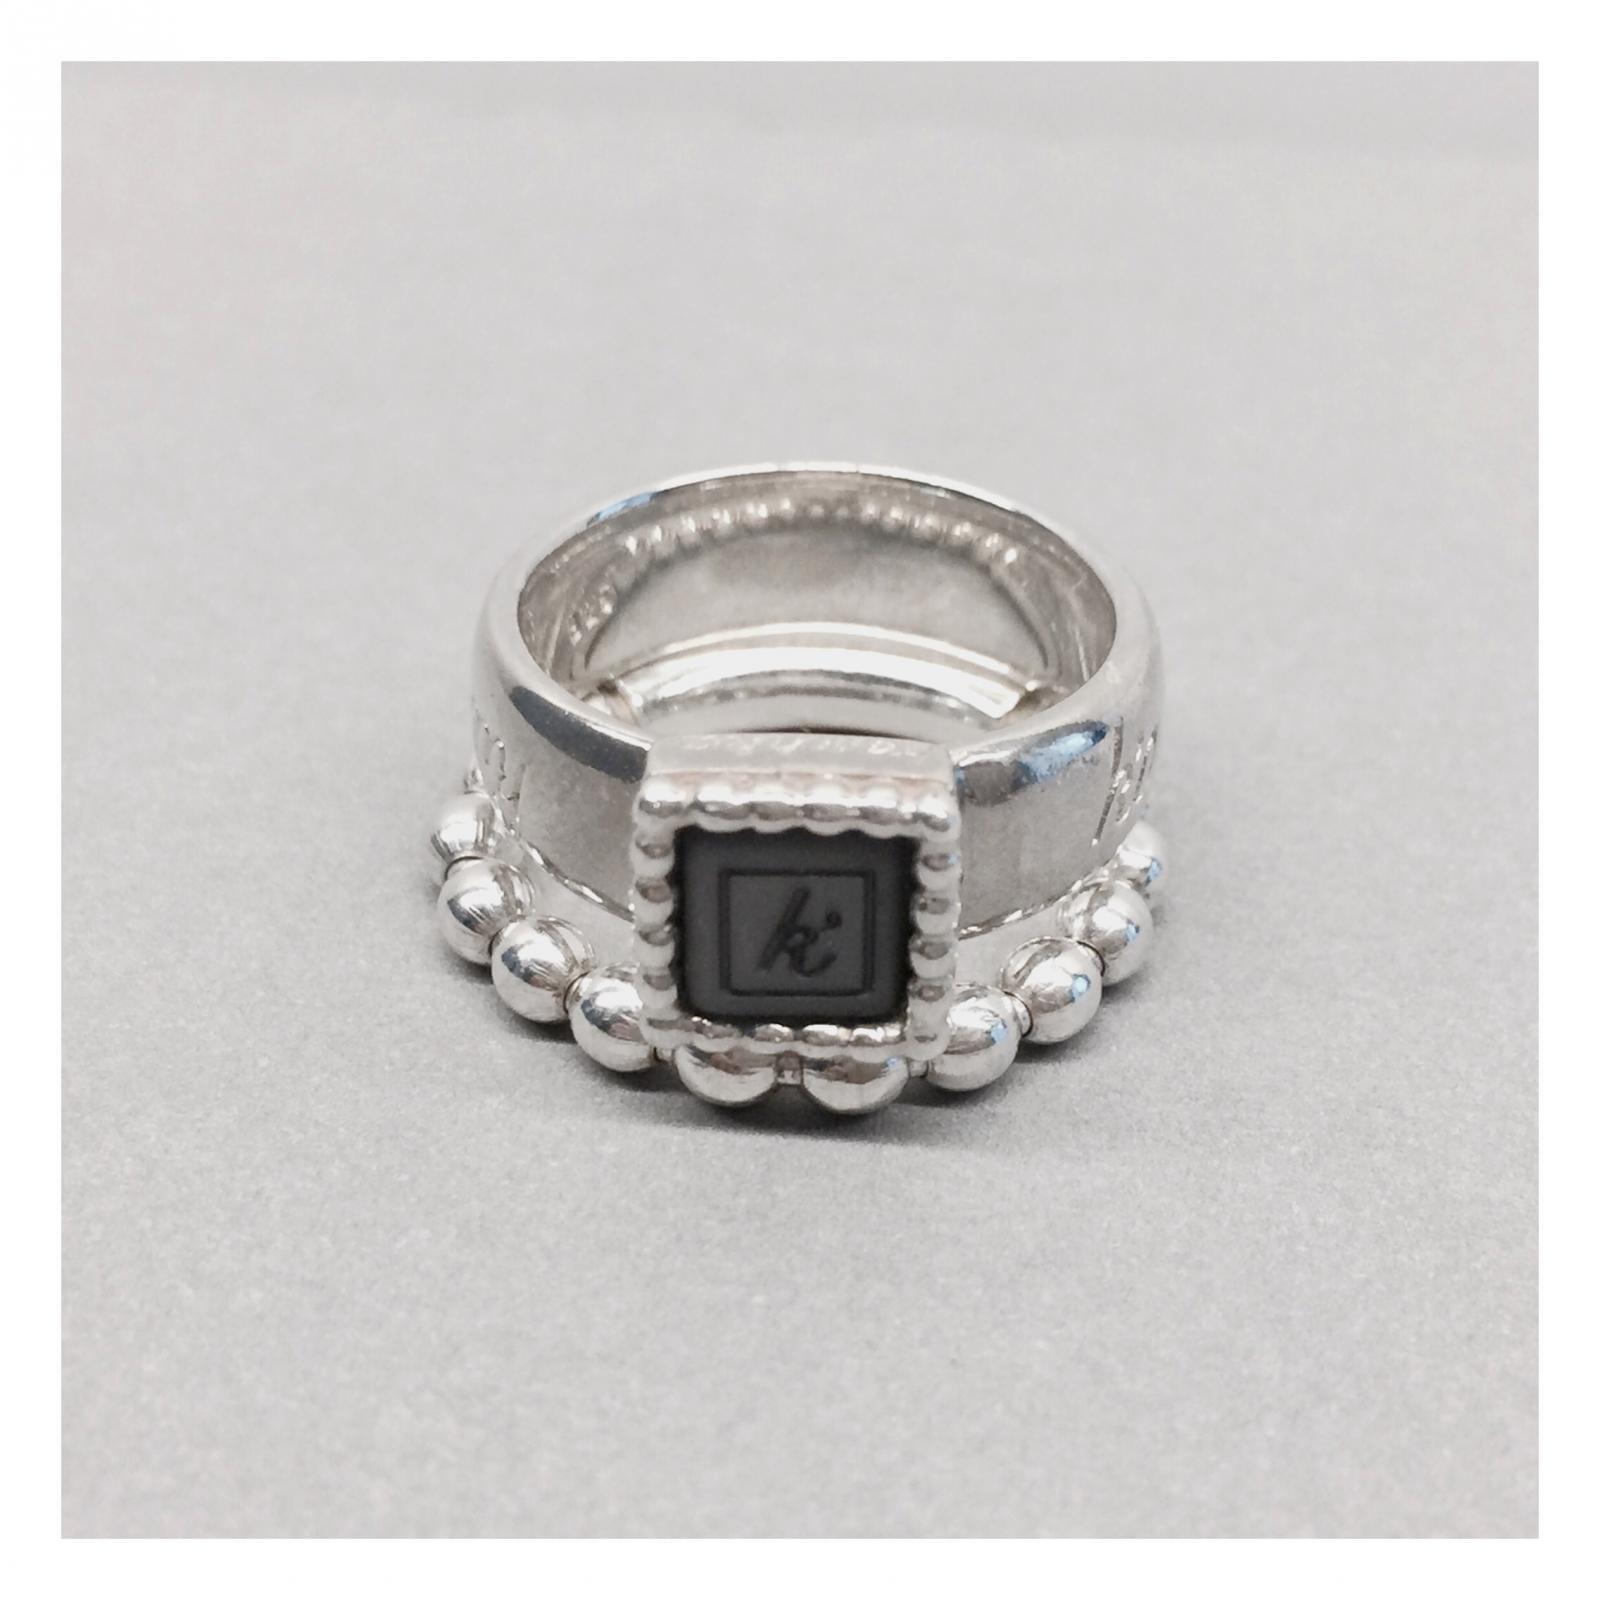 Flexibele ring 925 sterling zilveren vierkante kasminis ring